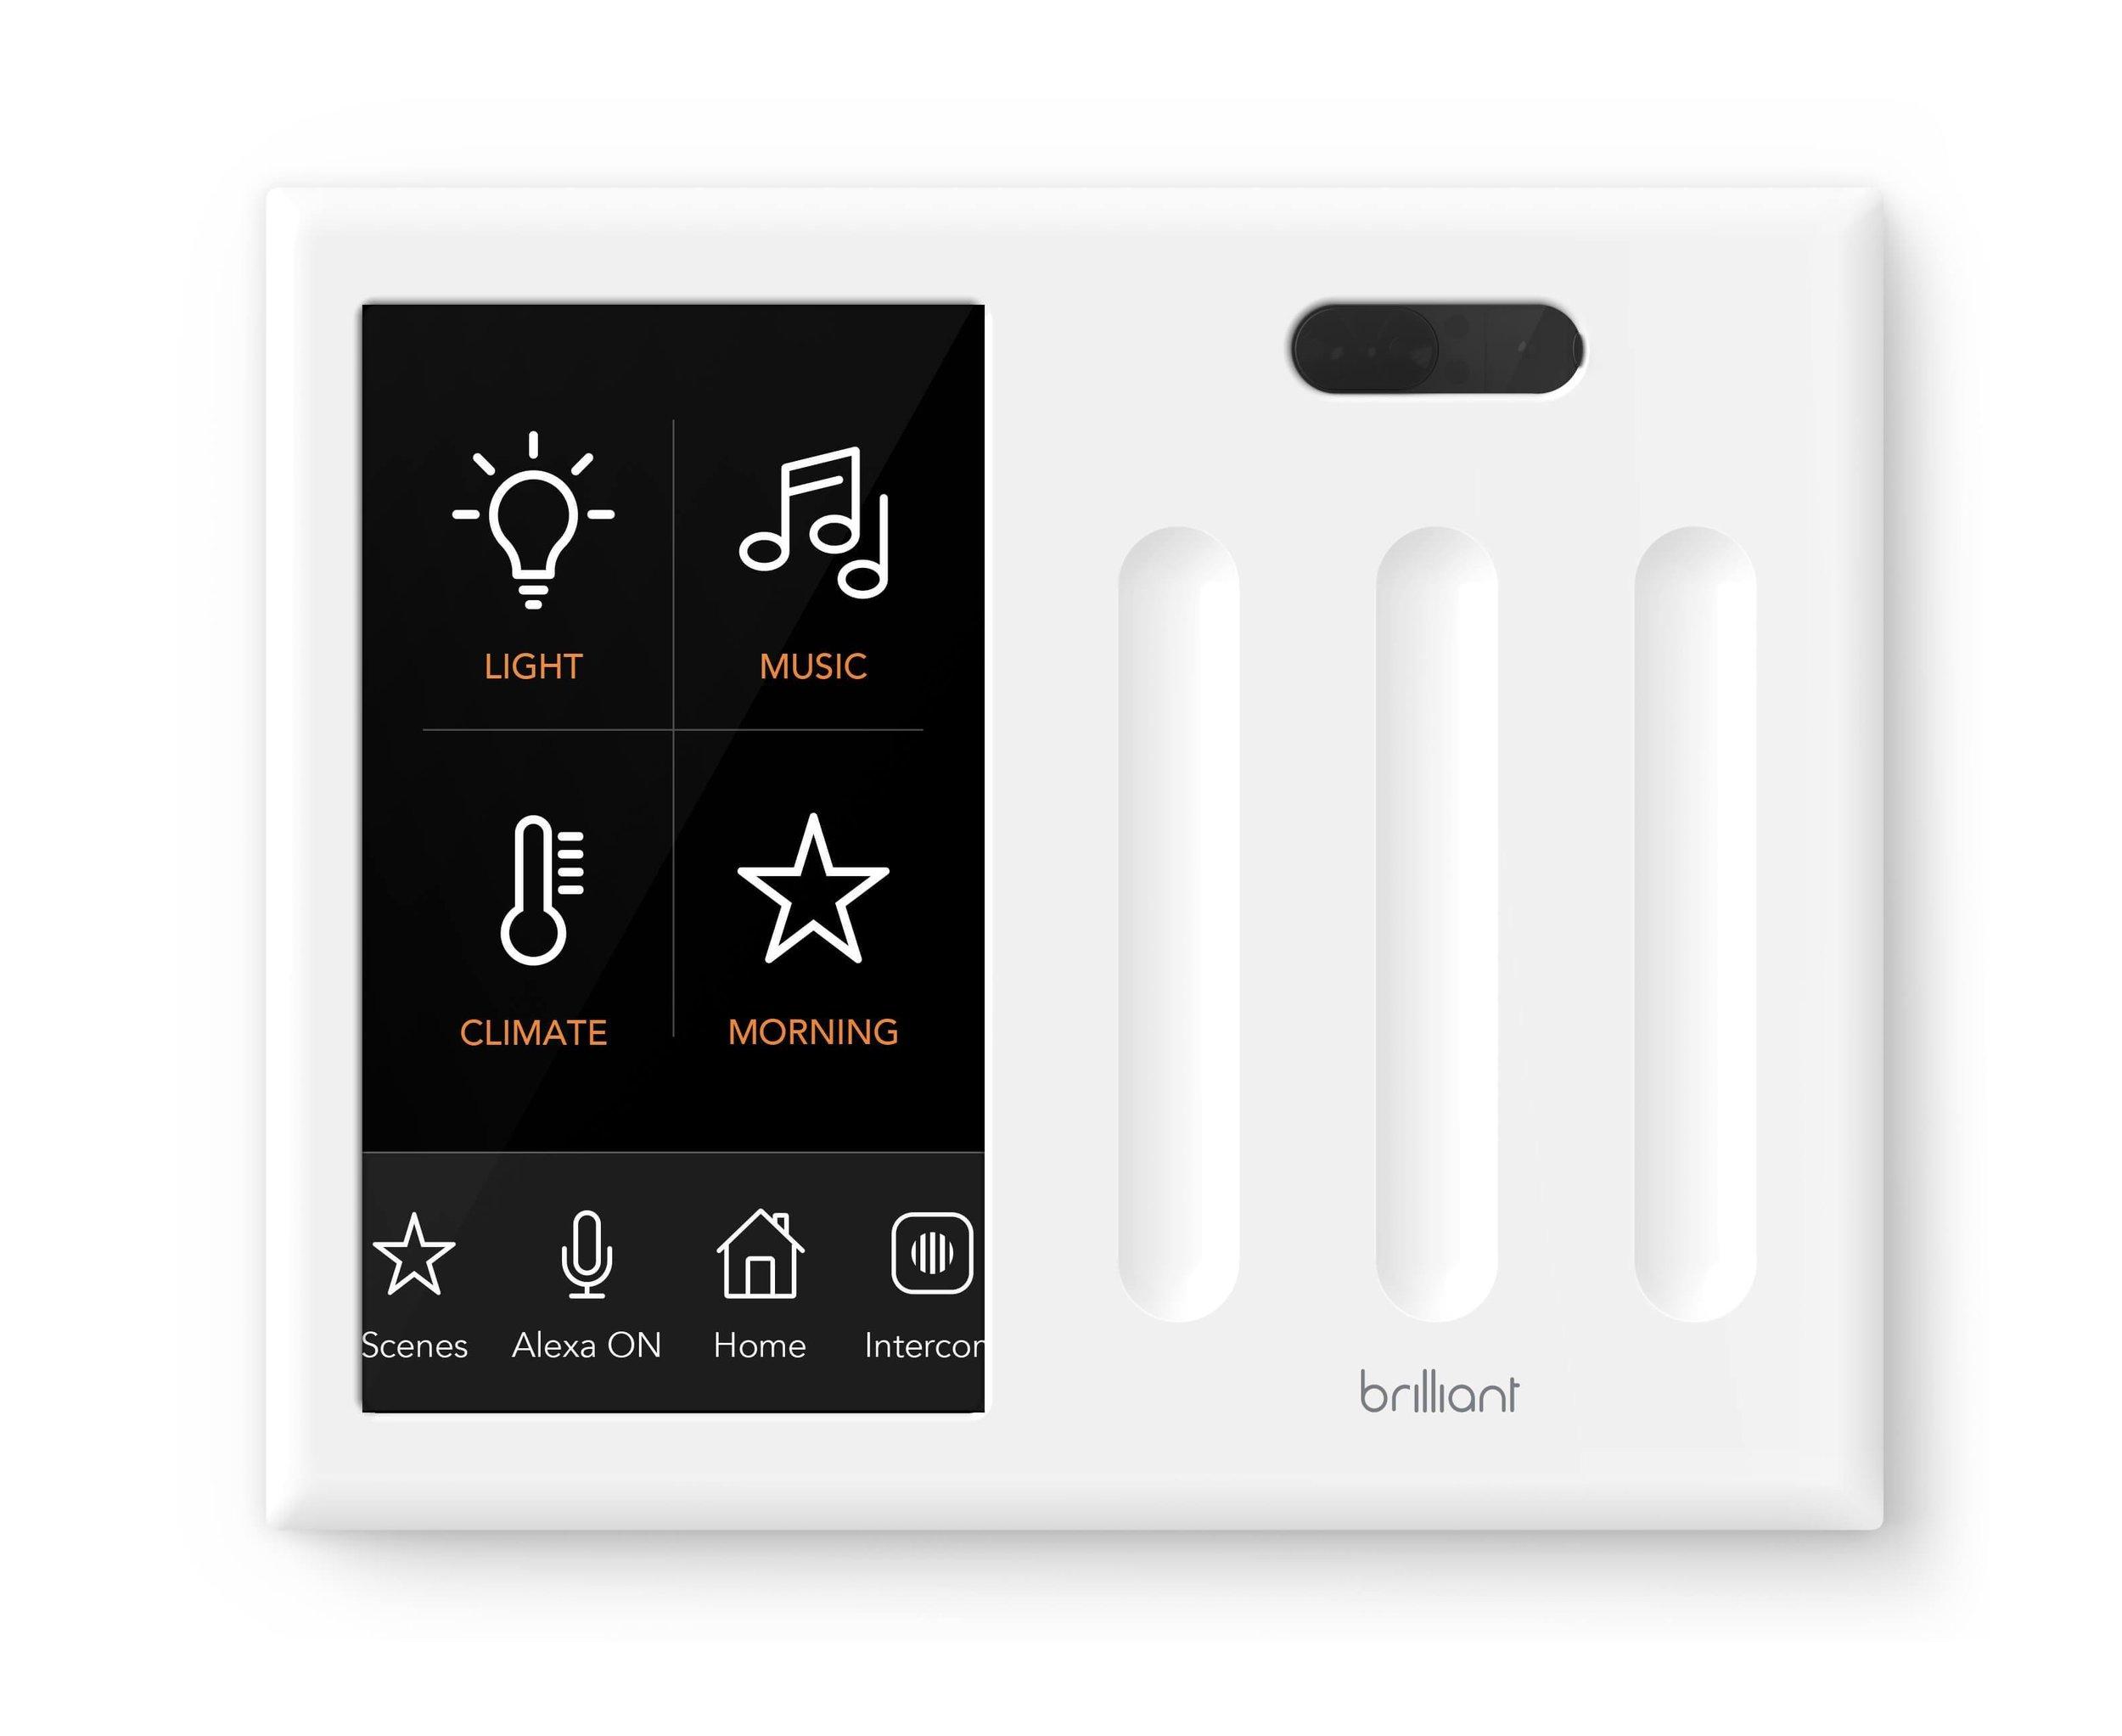 brilliant 3 light switch